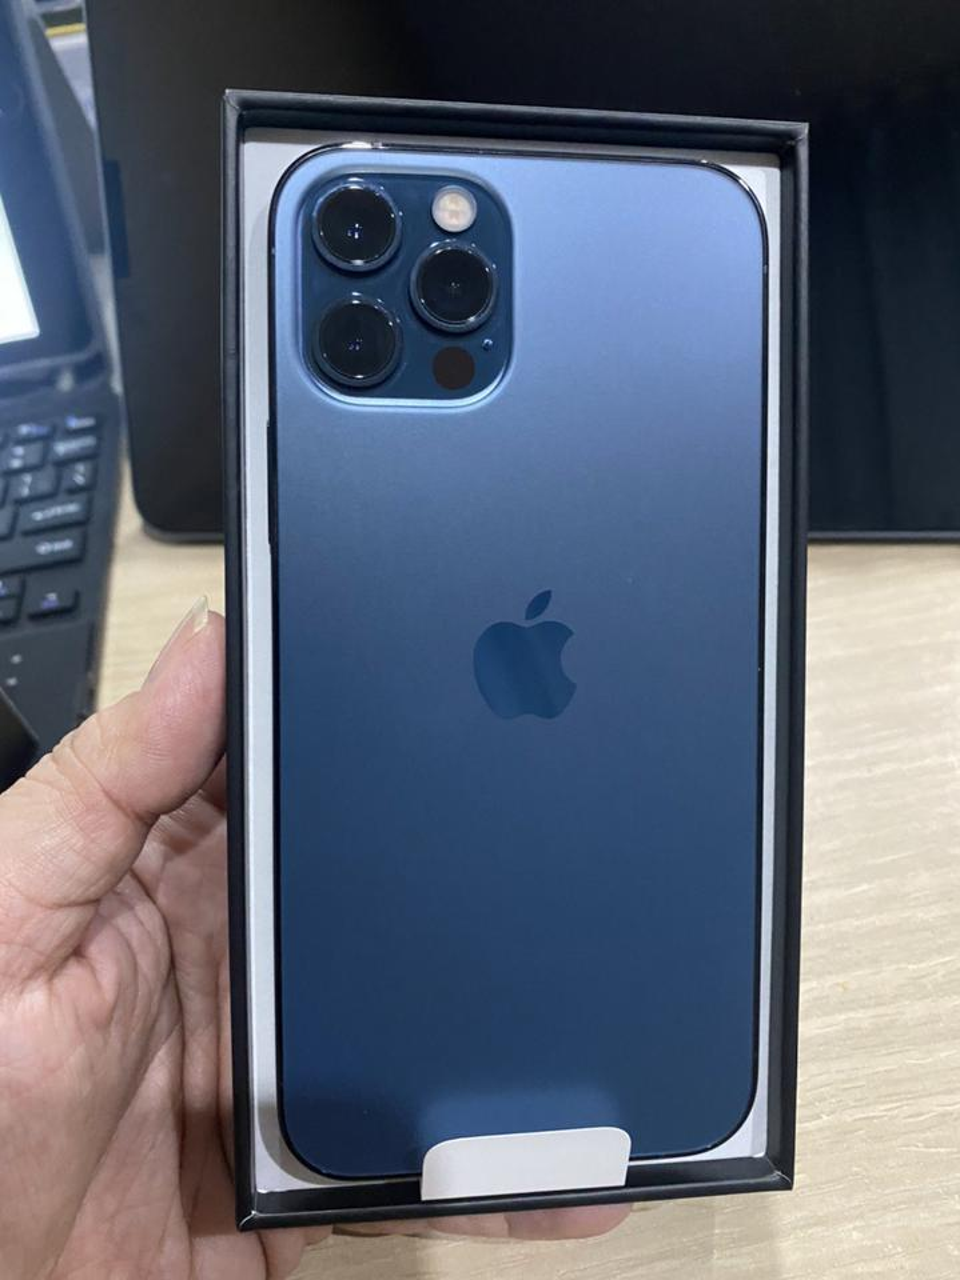 Iphone 12 Pro 128GB เครื่องใหม่ ศูนย์ไืทยสี Pacific Blue รูปที่ 3